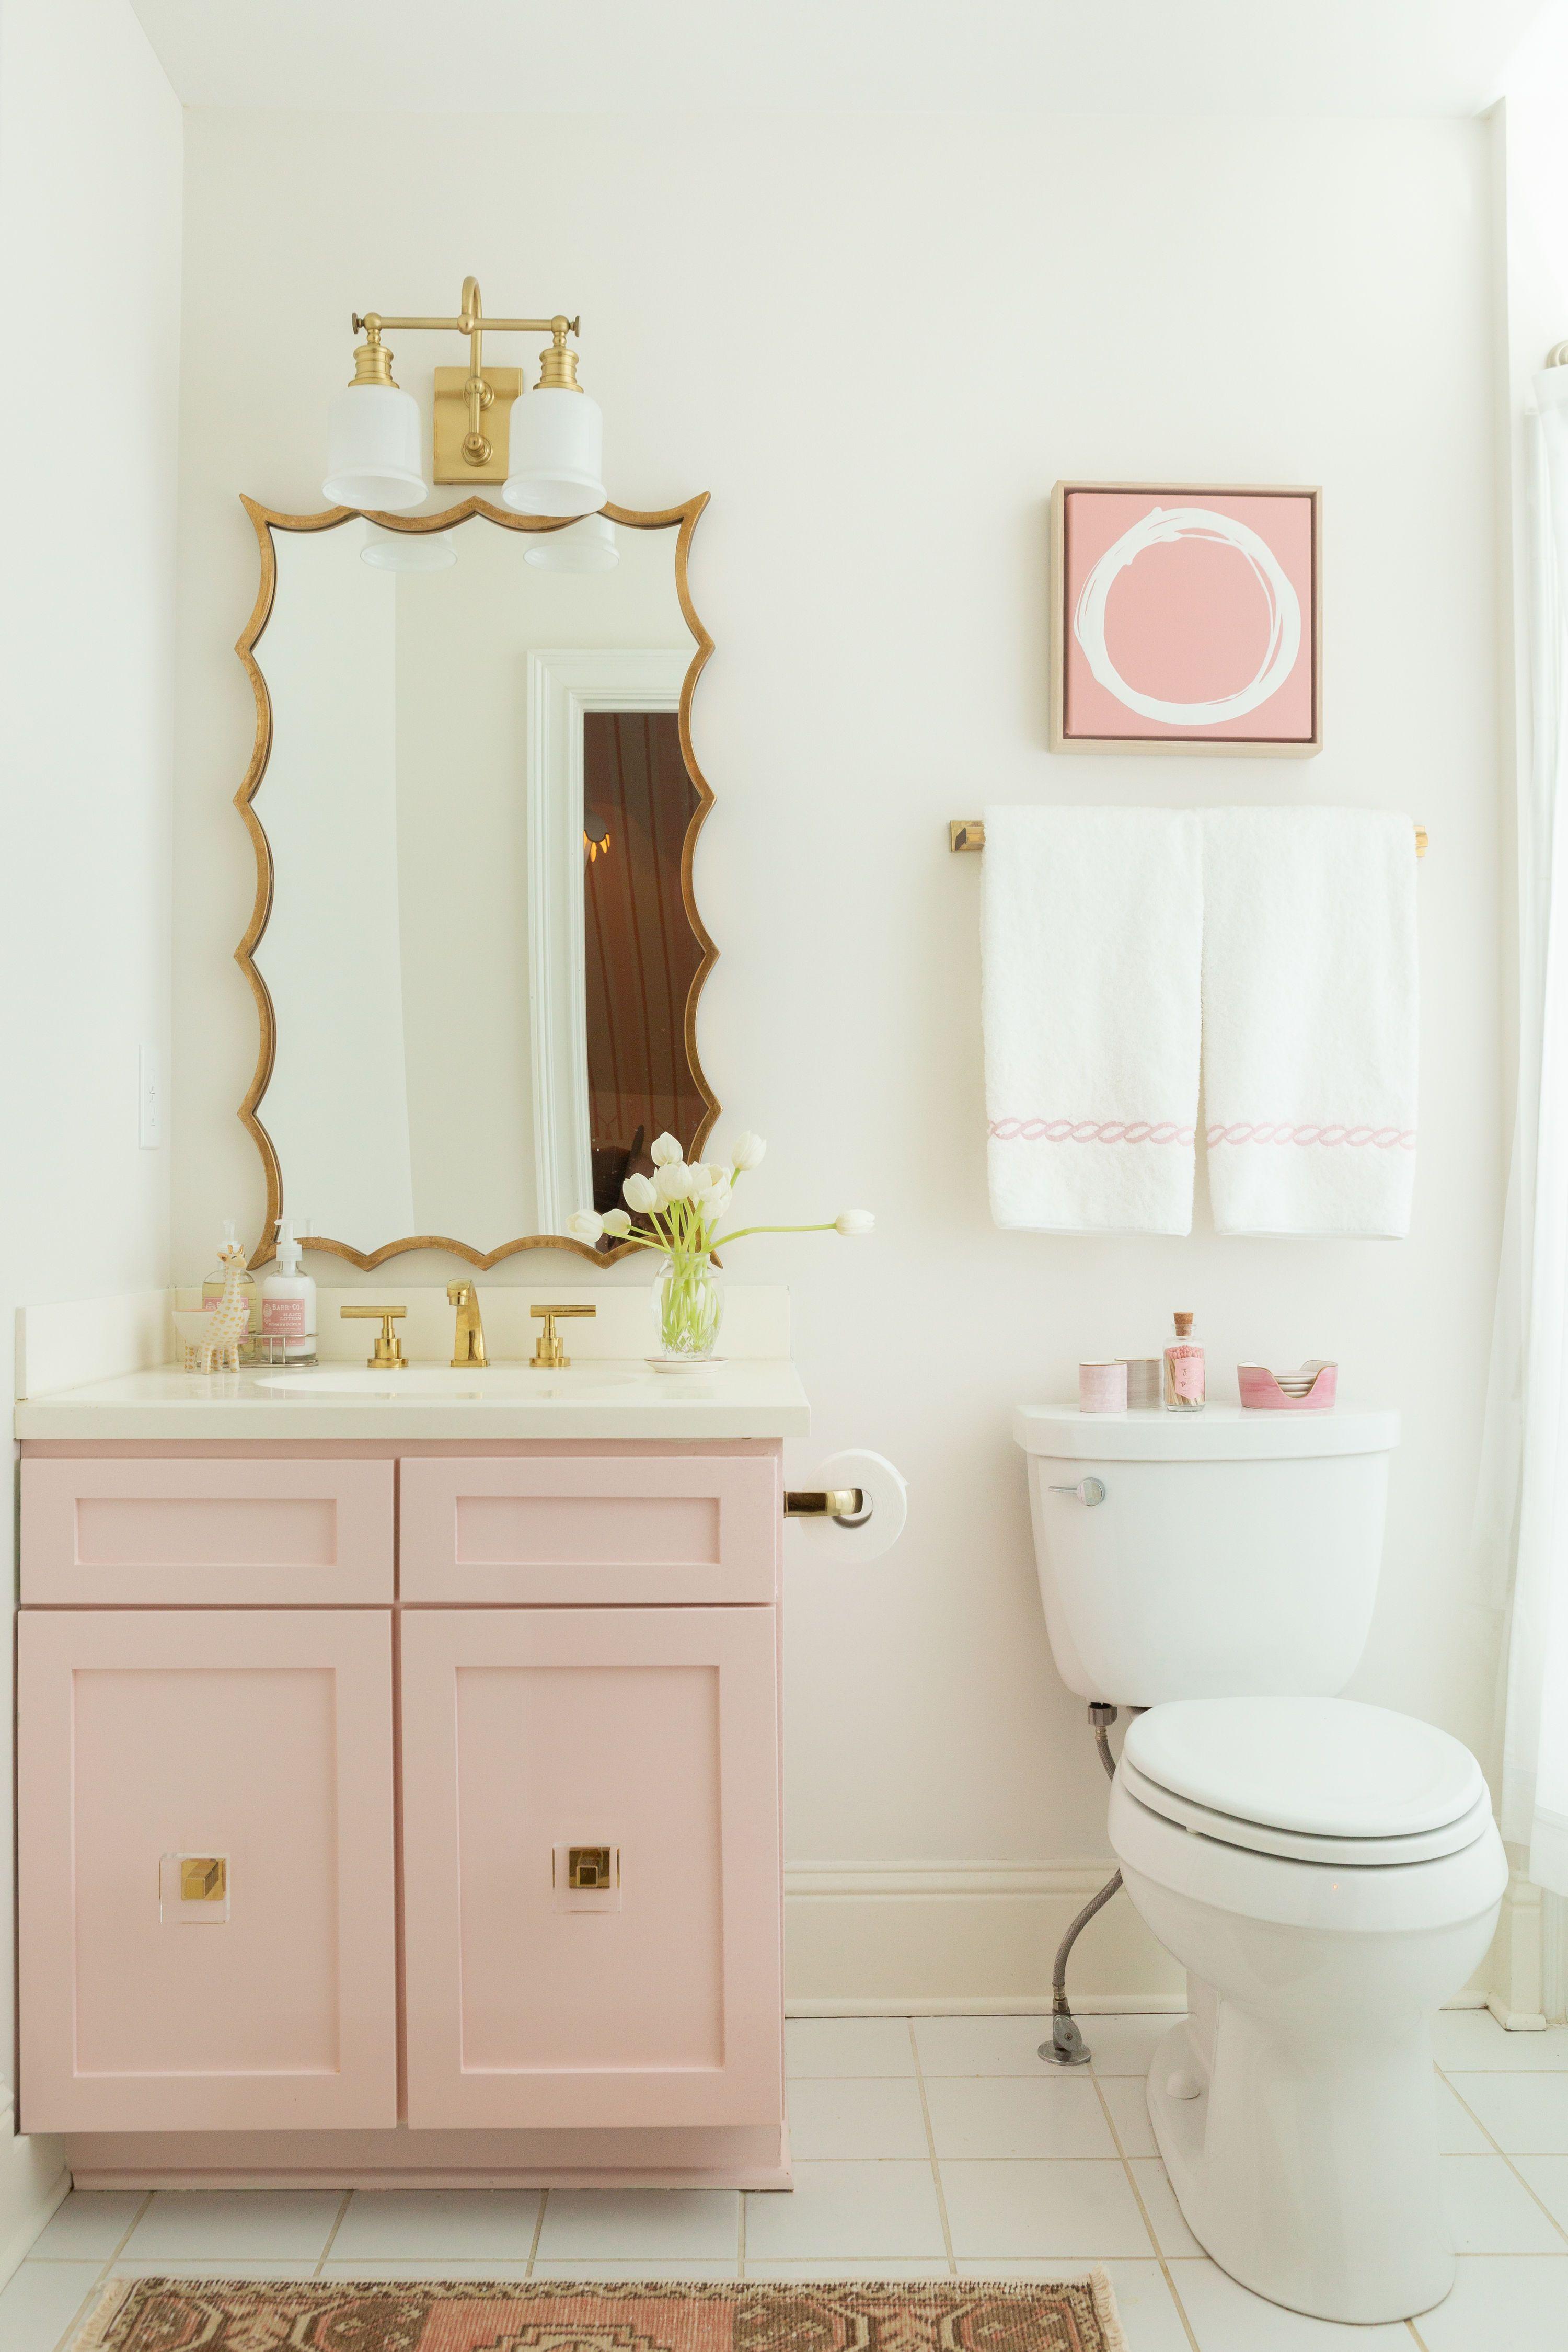 45++ Things in a bathroom info